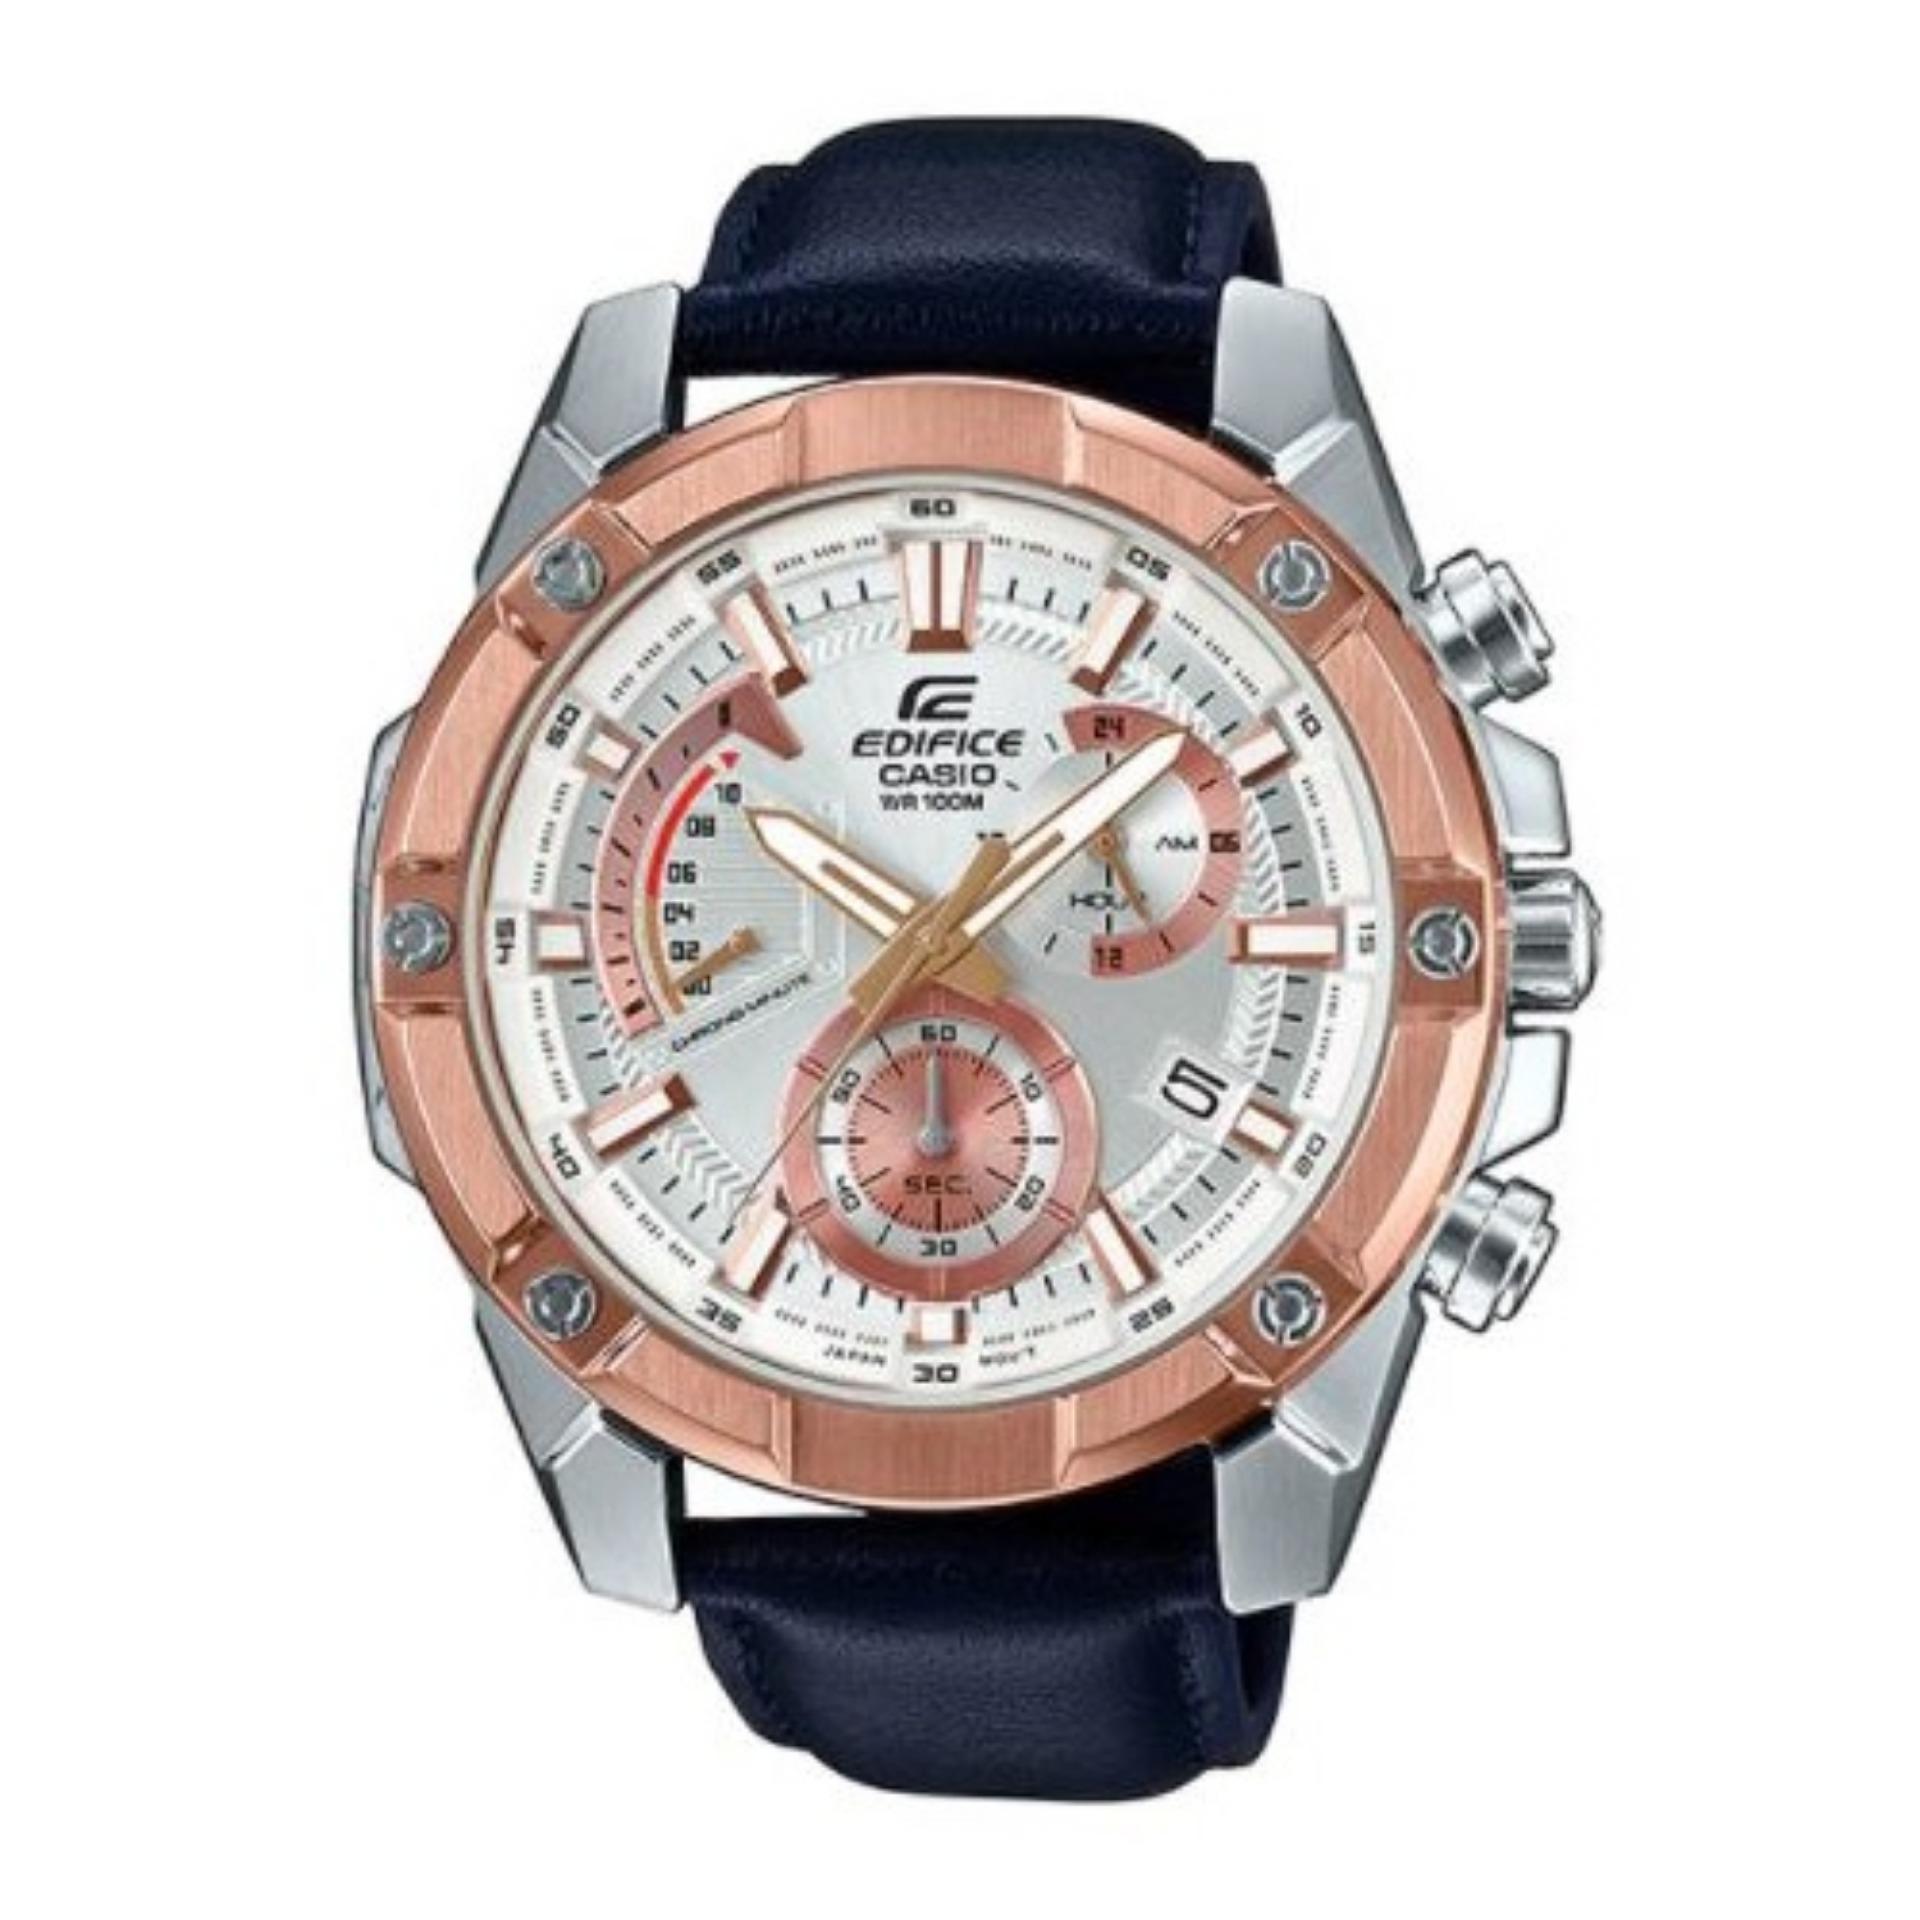 Casio Edifice EFR-559GL-7A Standard Chronograph Men's Watch